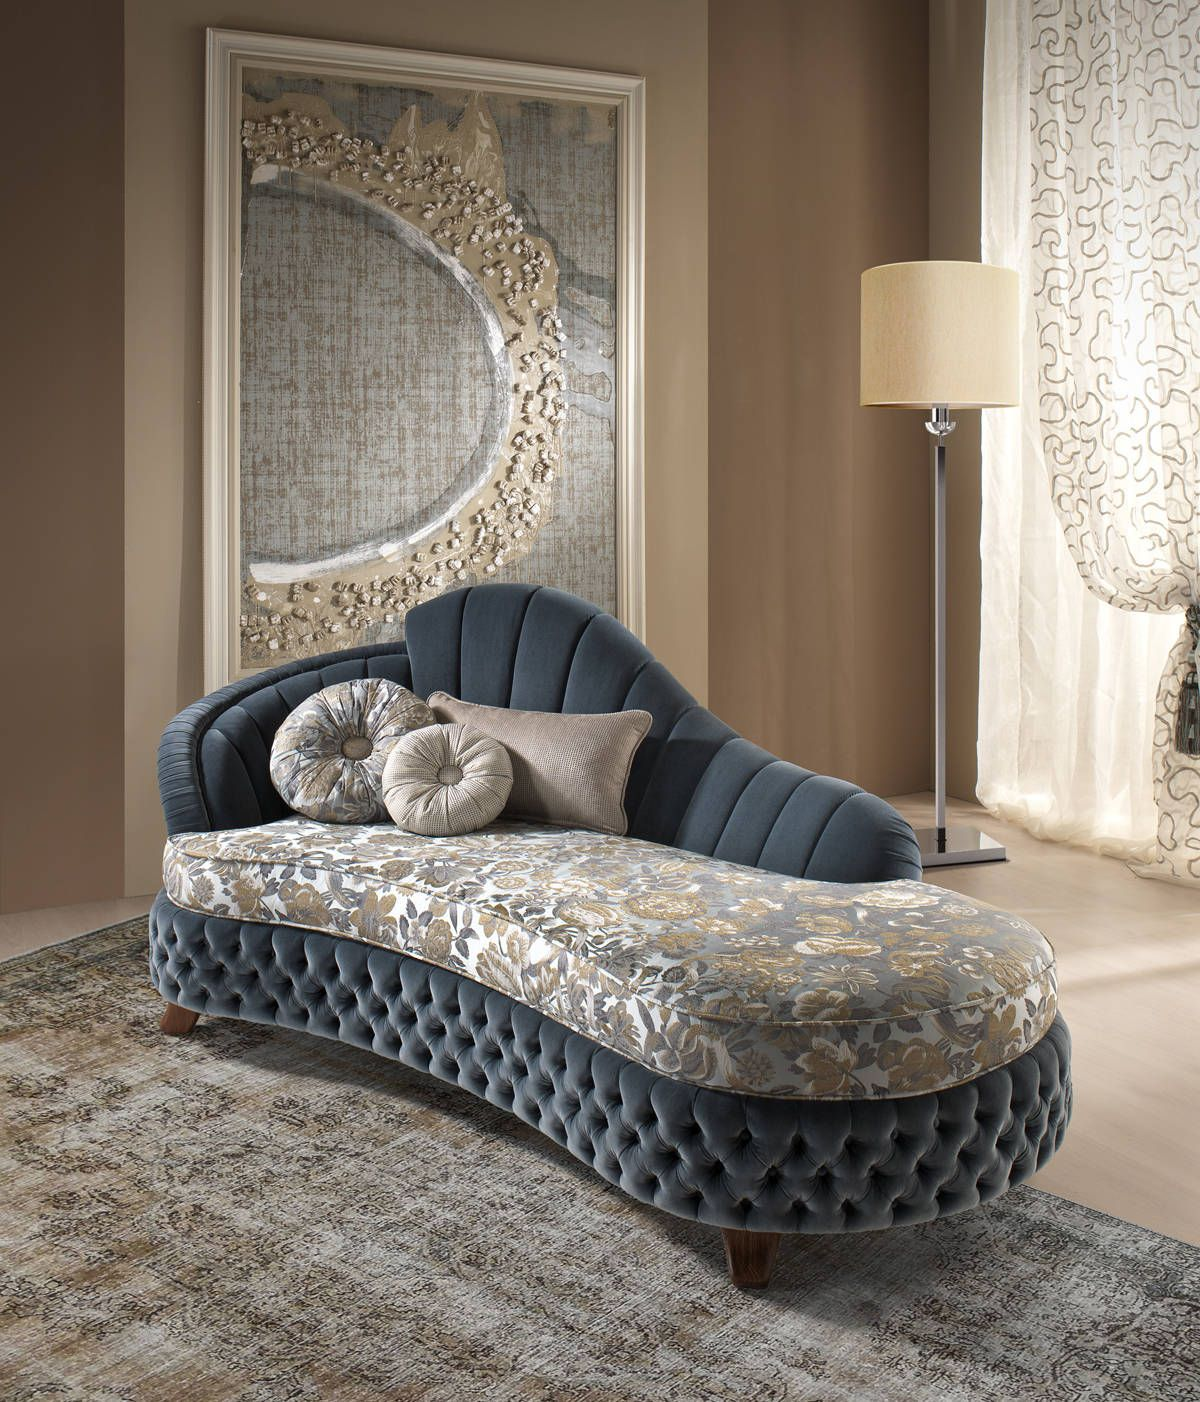 Pin By Pedro Nuñez On дизайн | Classic Sofa Designs, Sofa Design, Bed Furniture Design